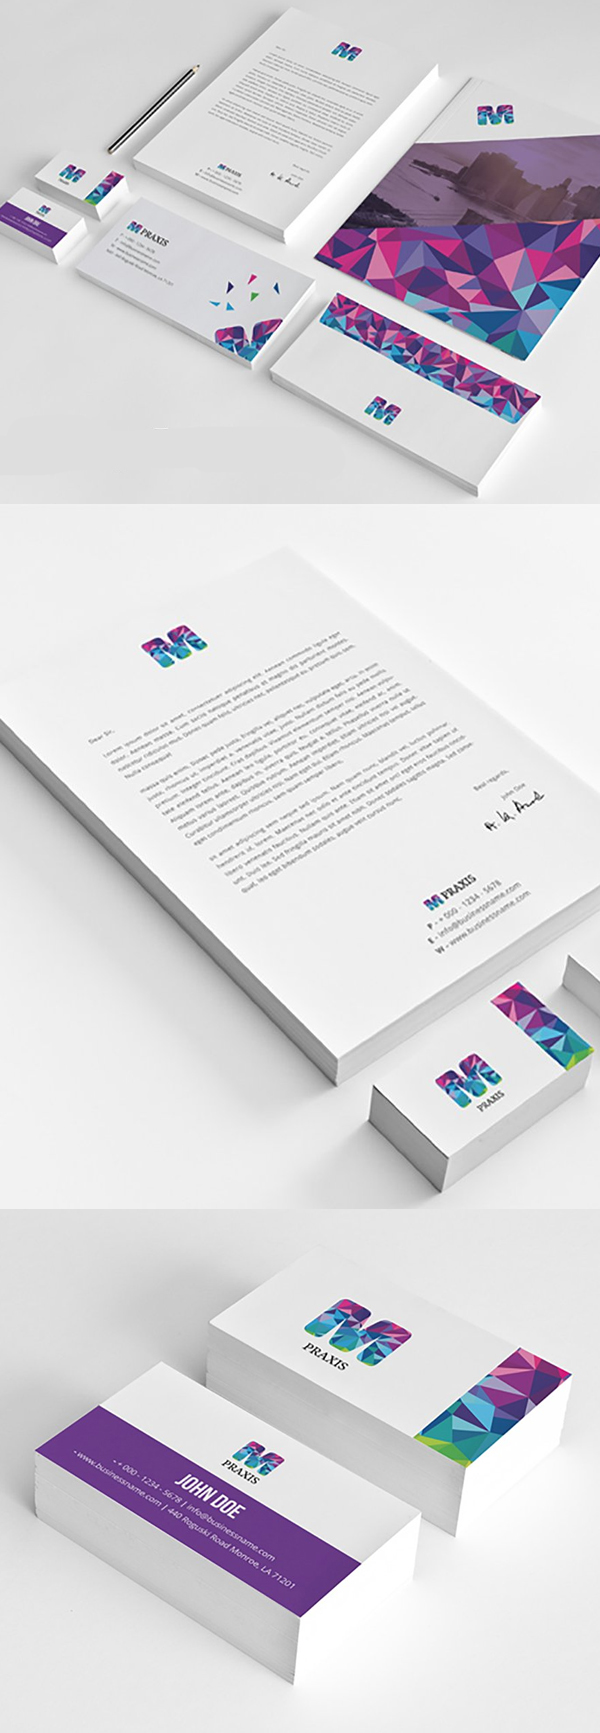 Modern Business Branding / Stationery Templates Design - 6